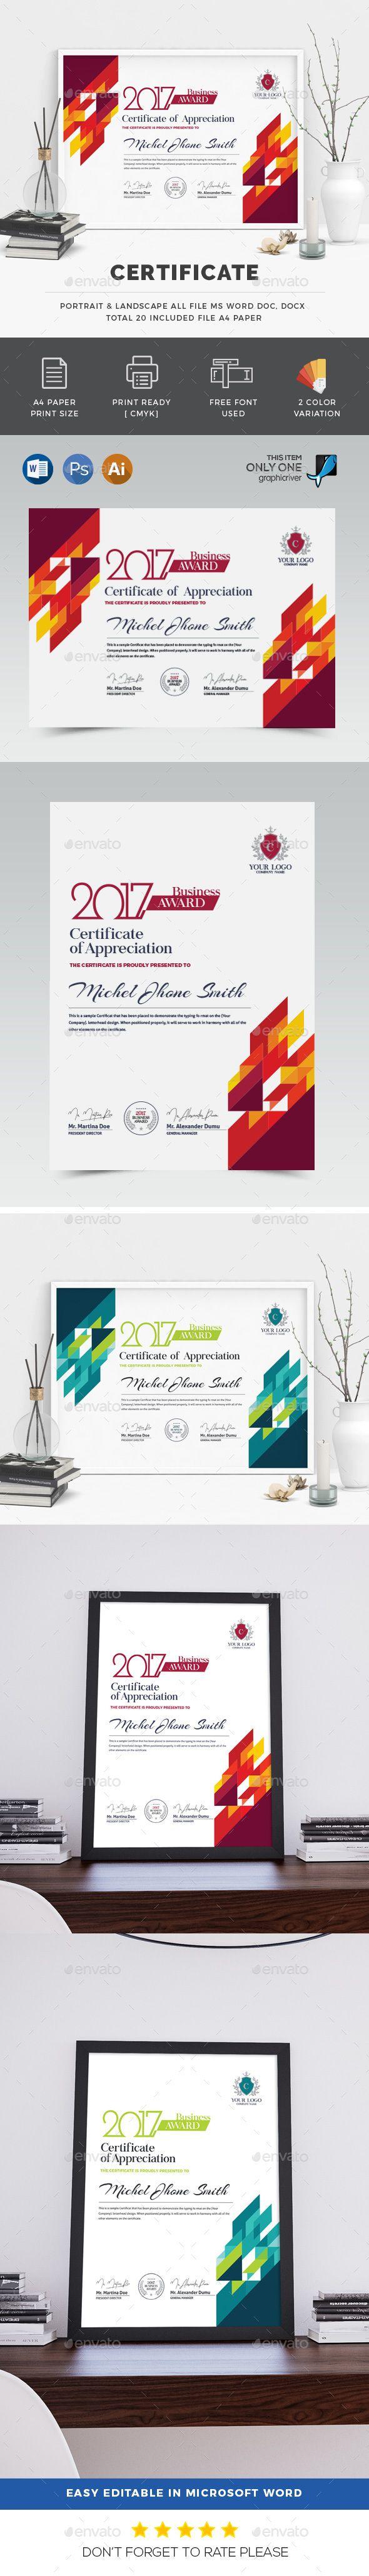 Certificate Template PSD, AI Illustrator, MS Word